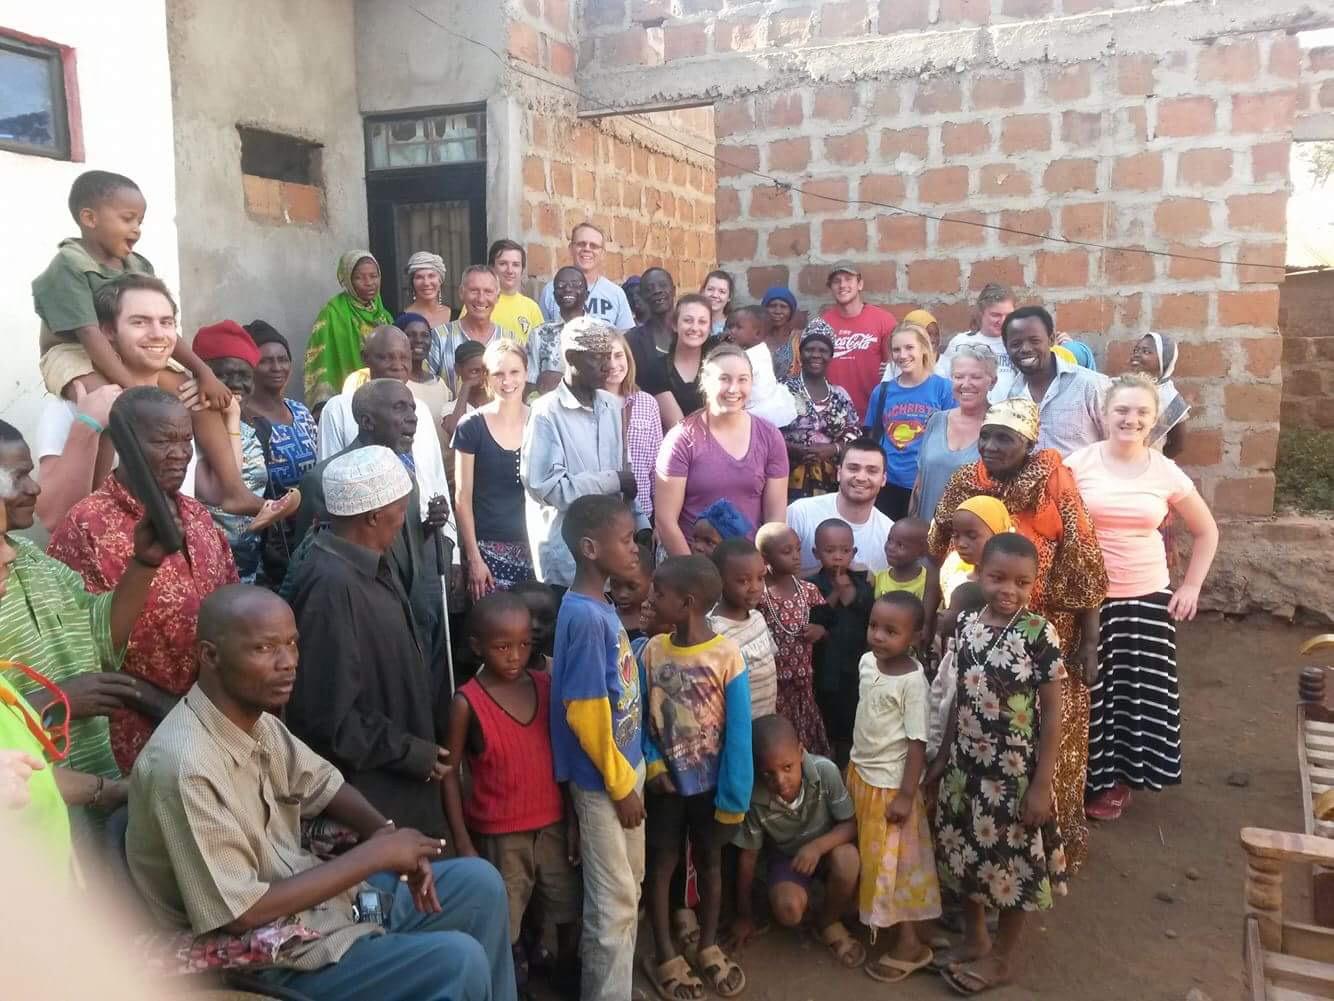 lepers of kilimanjaro project 2.JPG